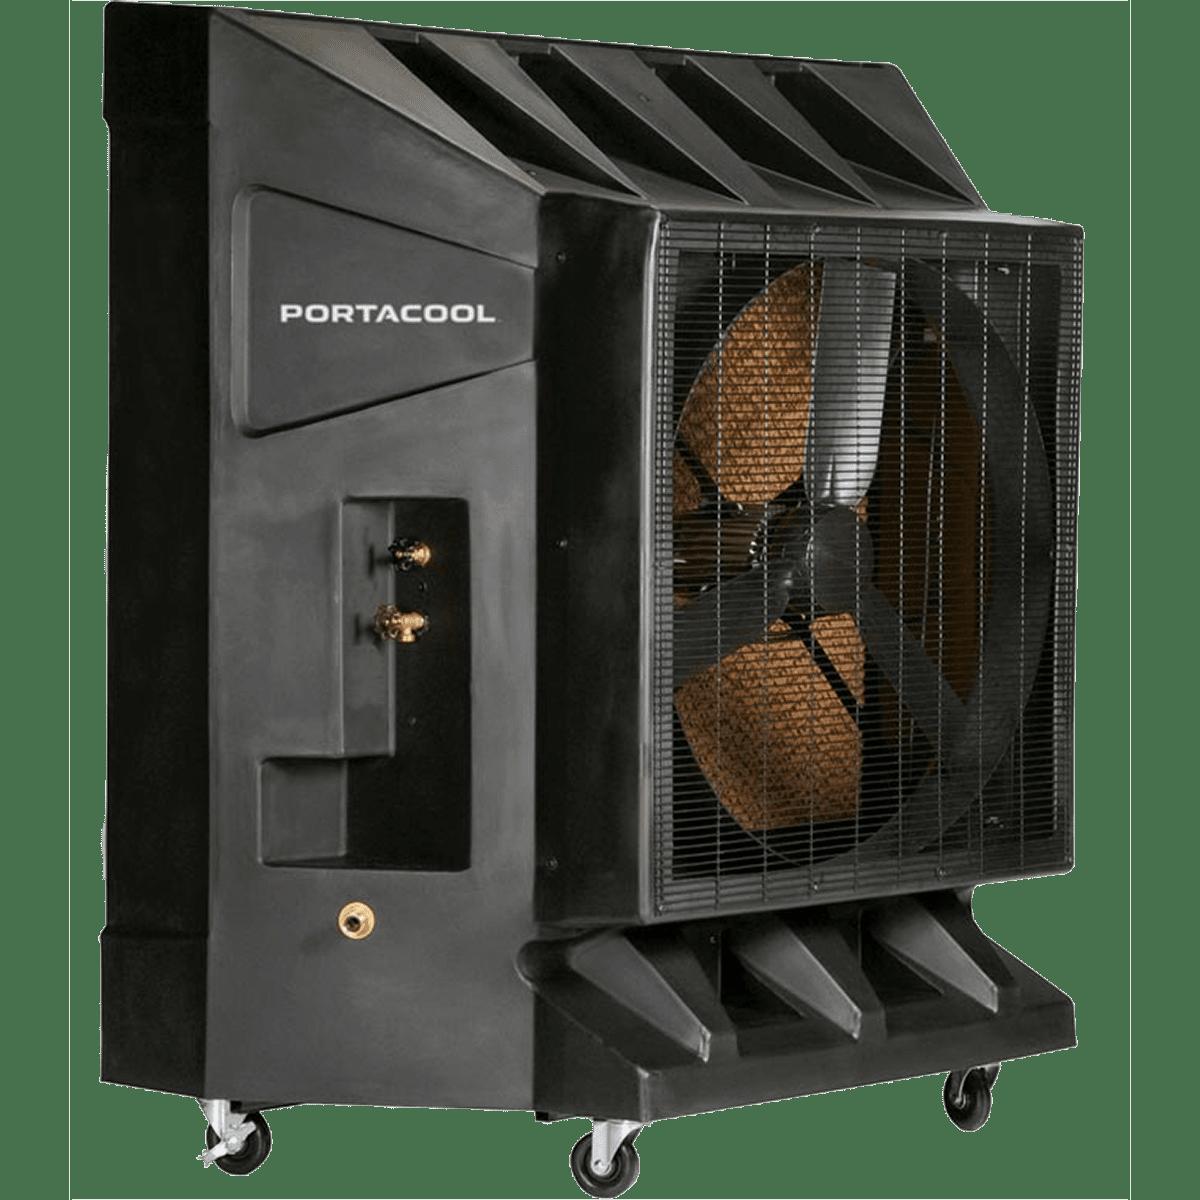 Port-A-Cool 36-Inch Portable Evaporative Coolers po2143